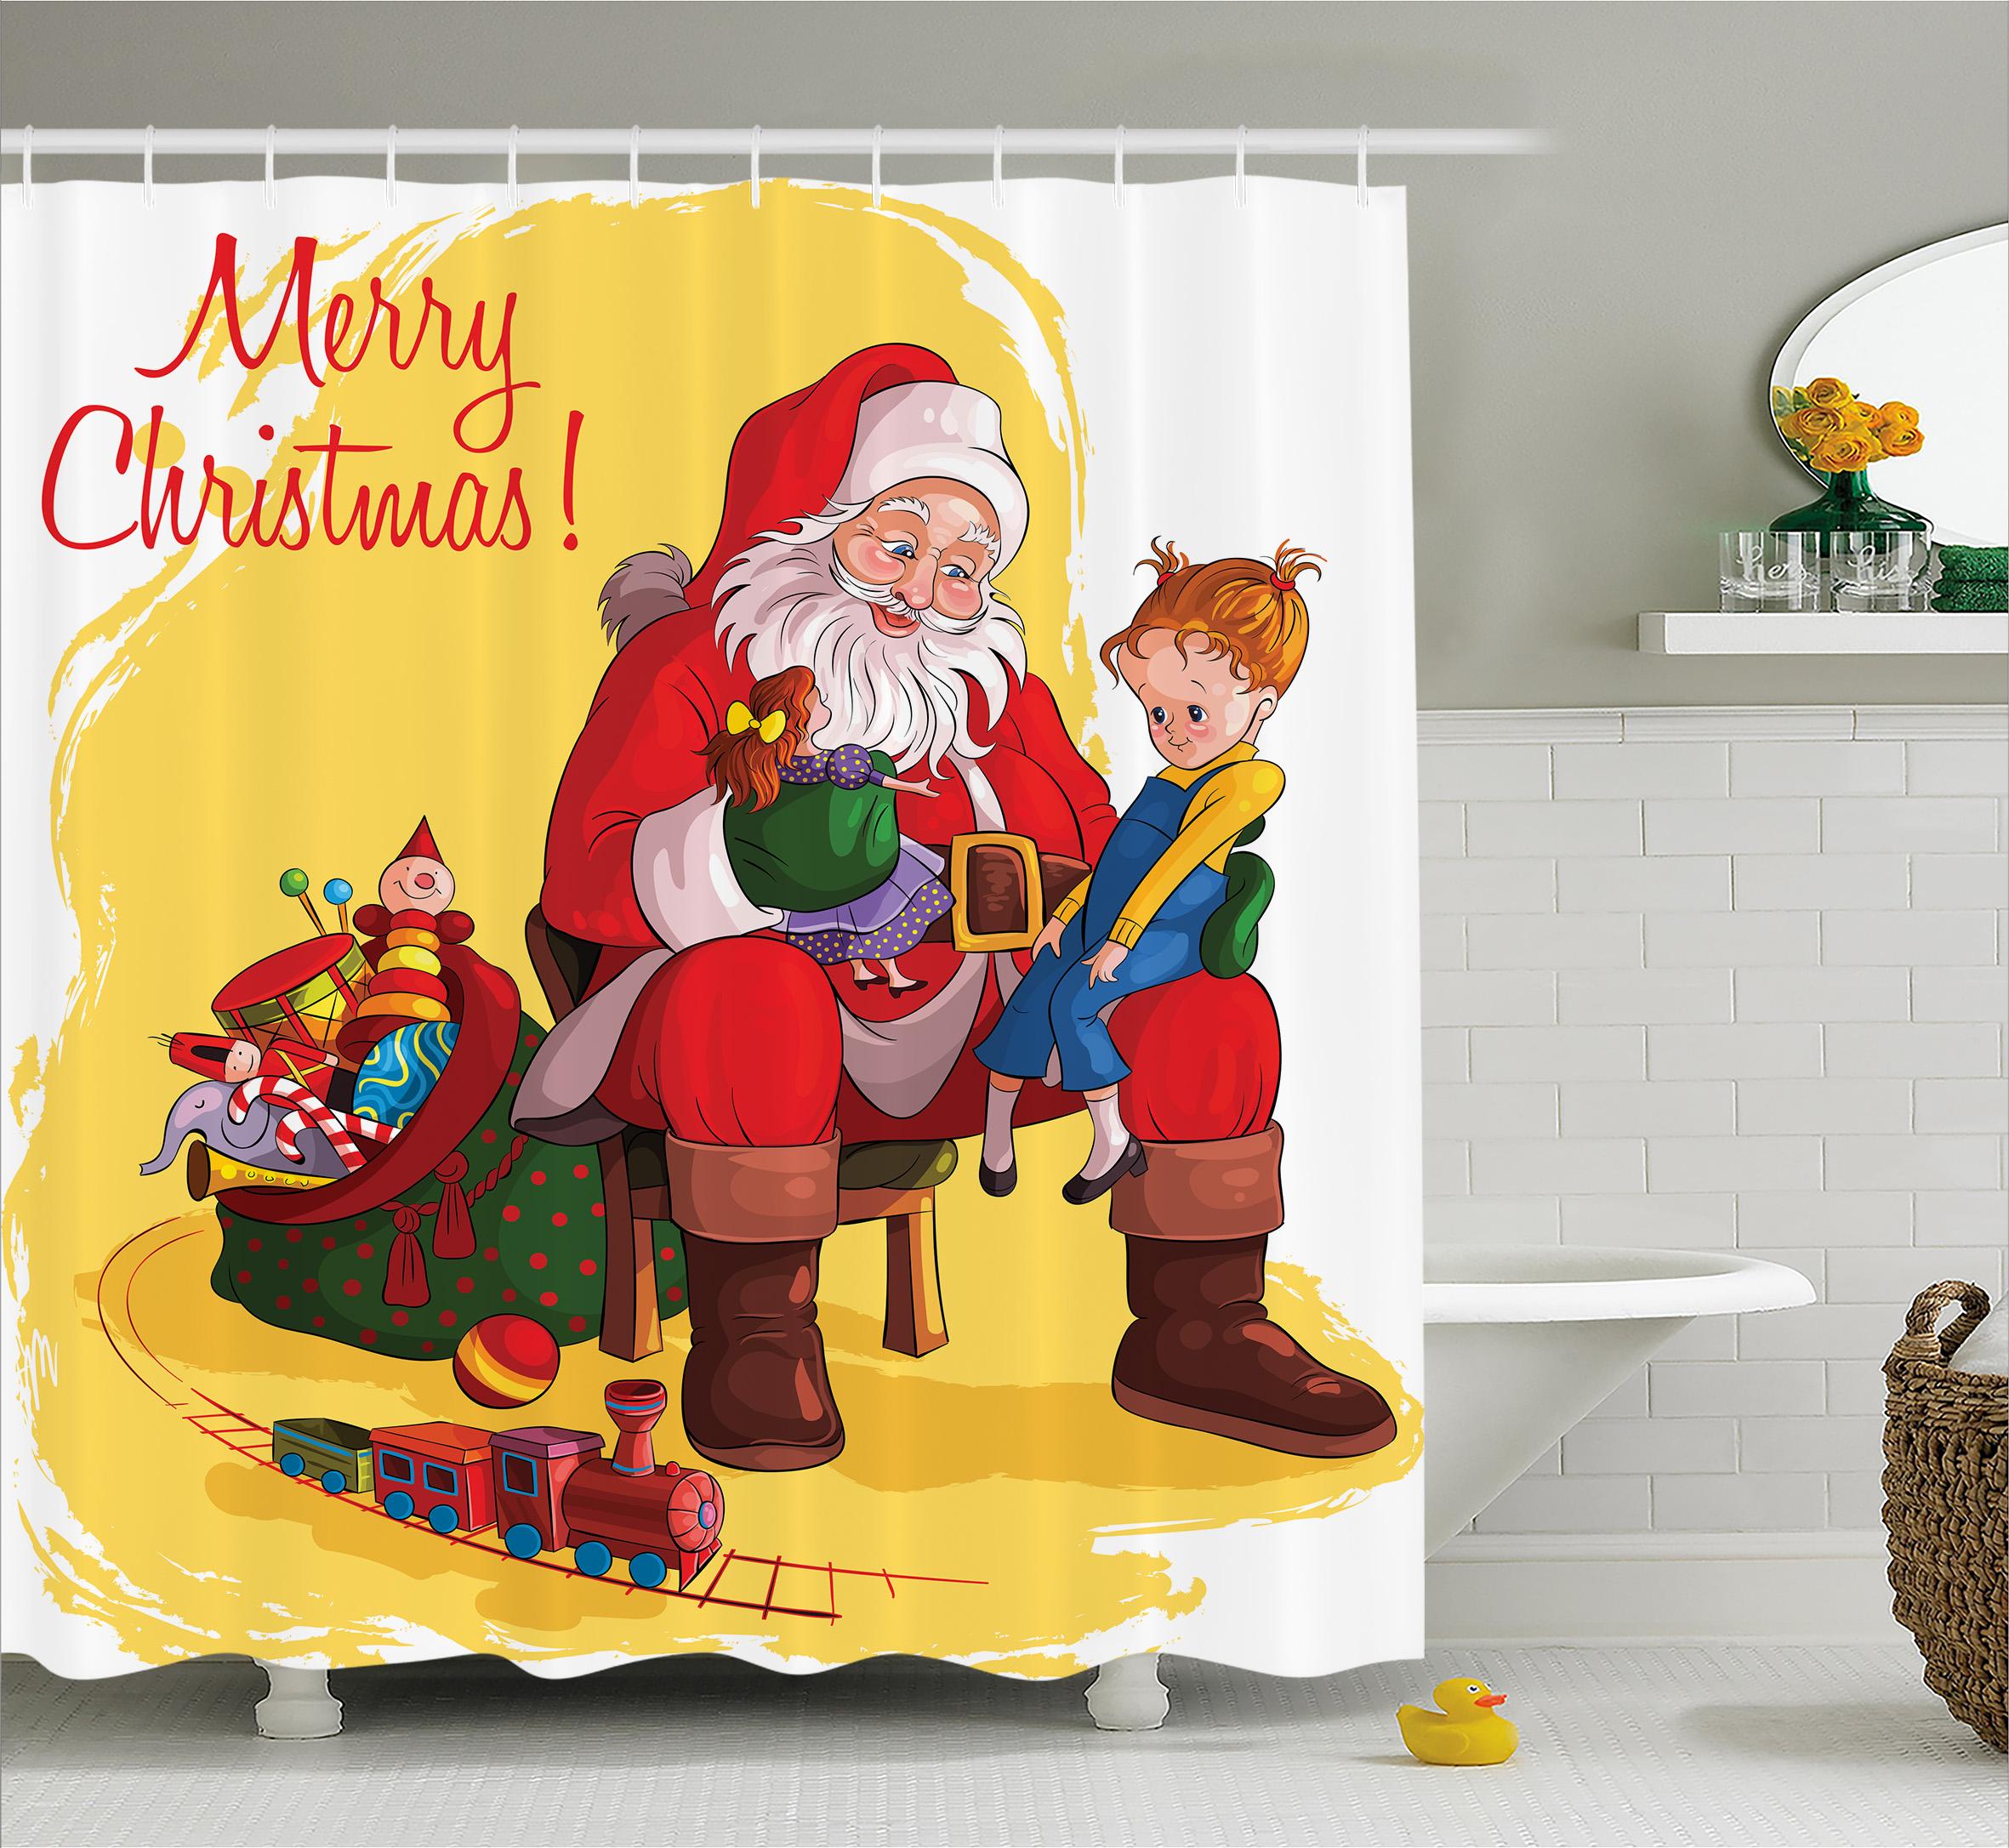 Christmas Shower Curtain Set, Little Child Sitting on San...